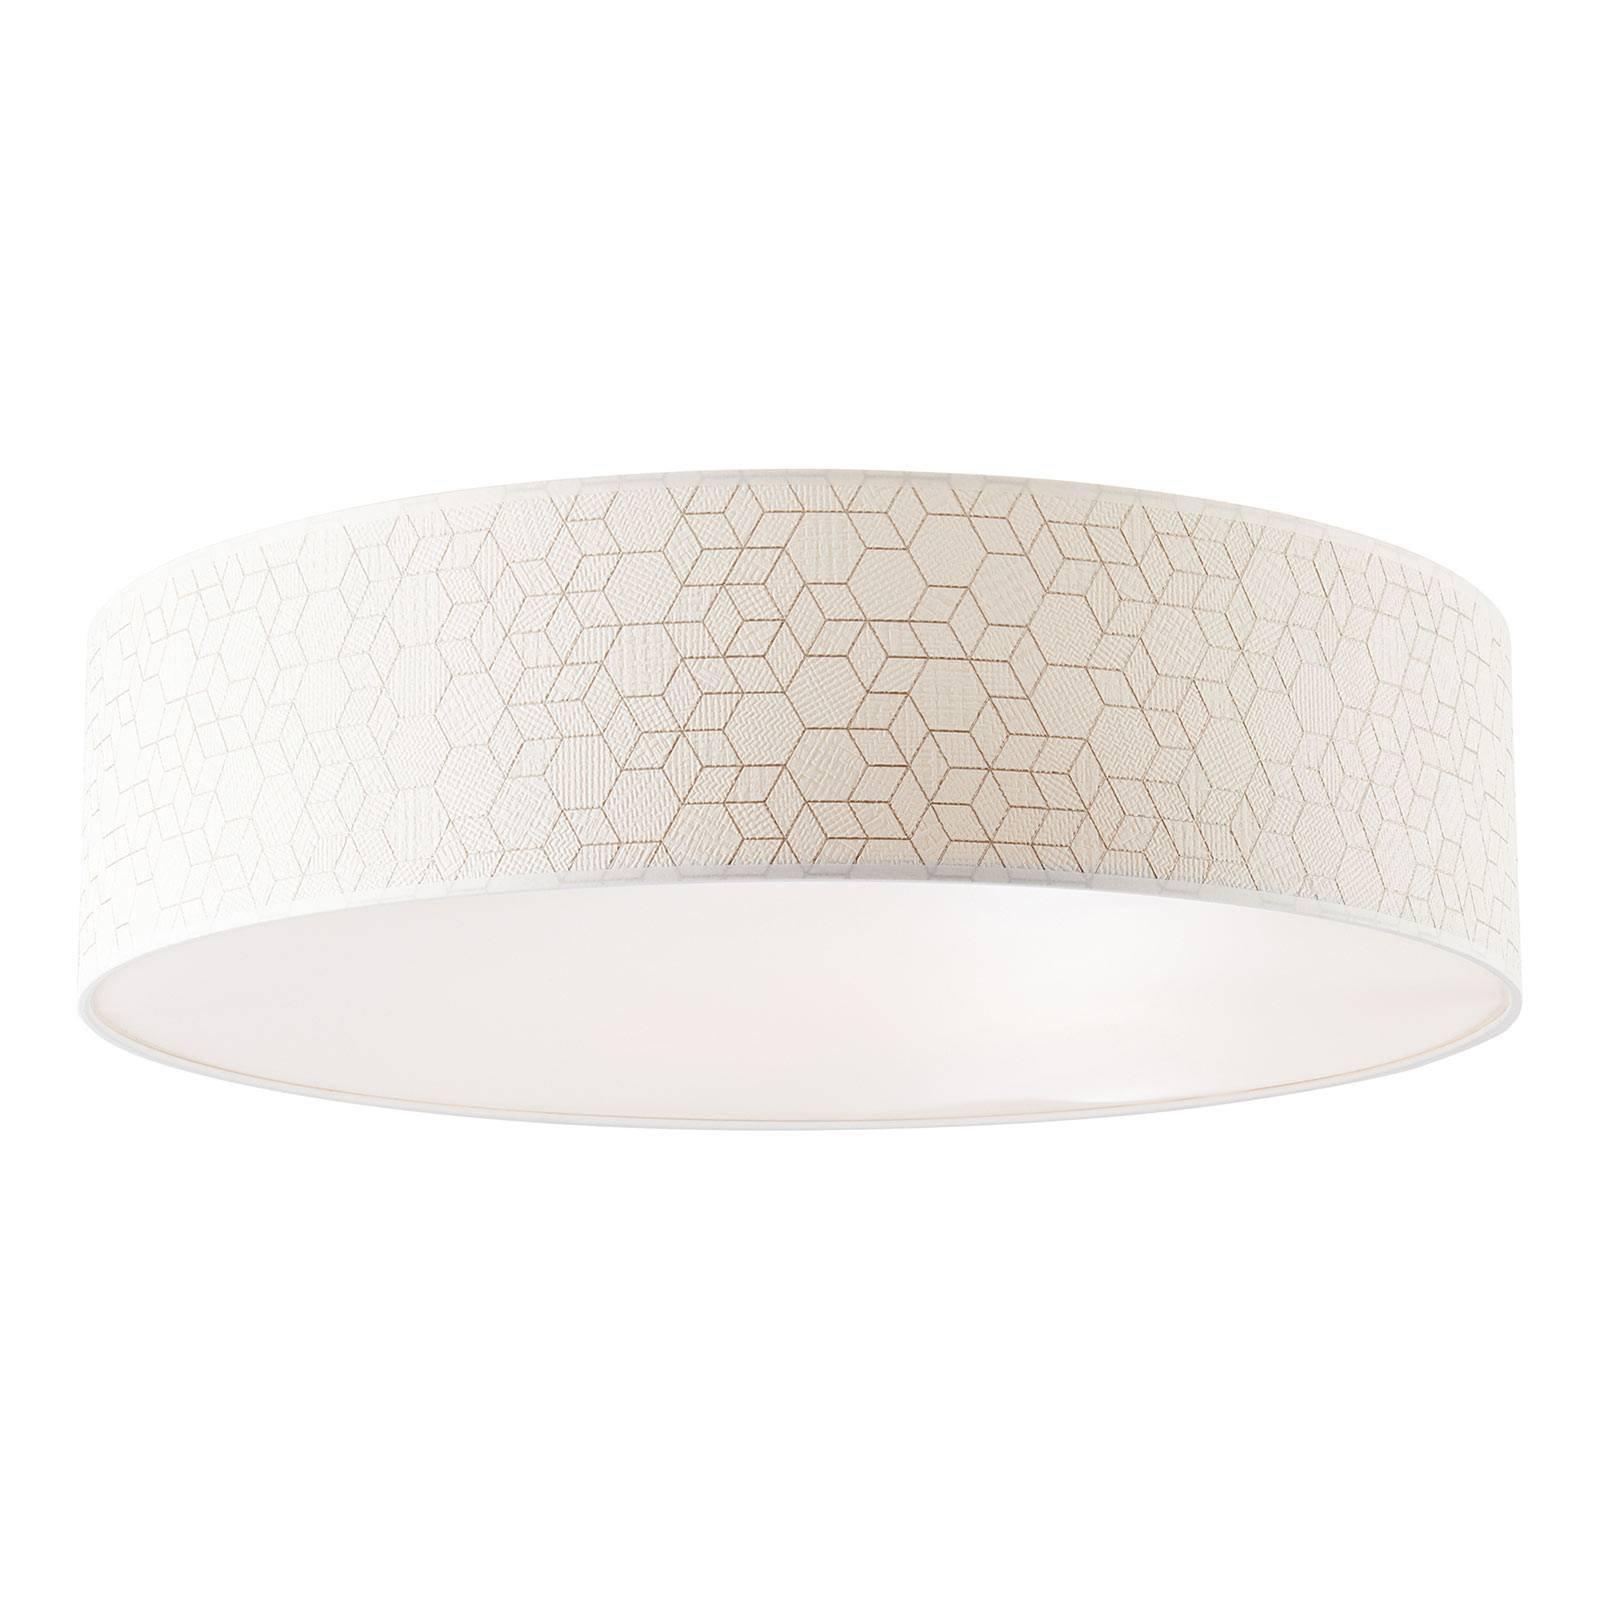 Taklampe Galance, hvit, Ø 58 cm